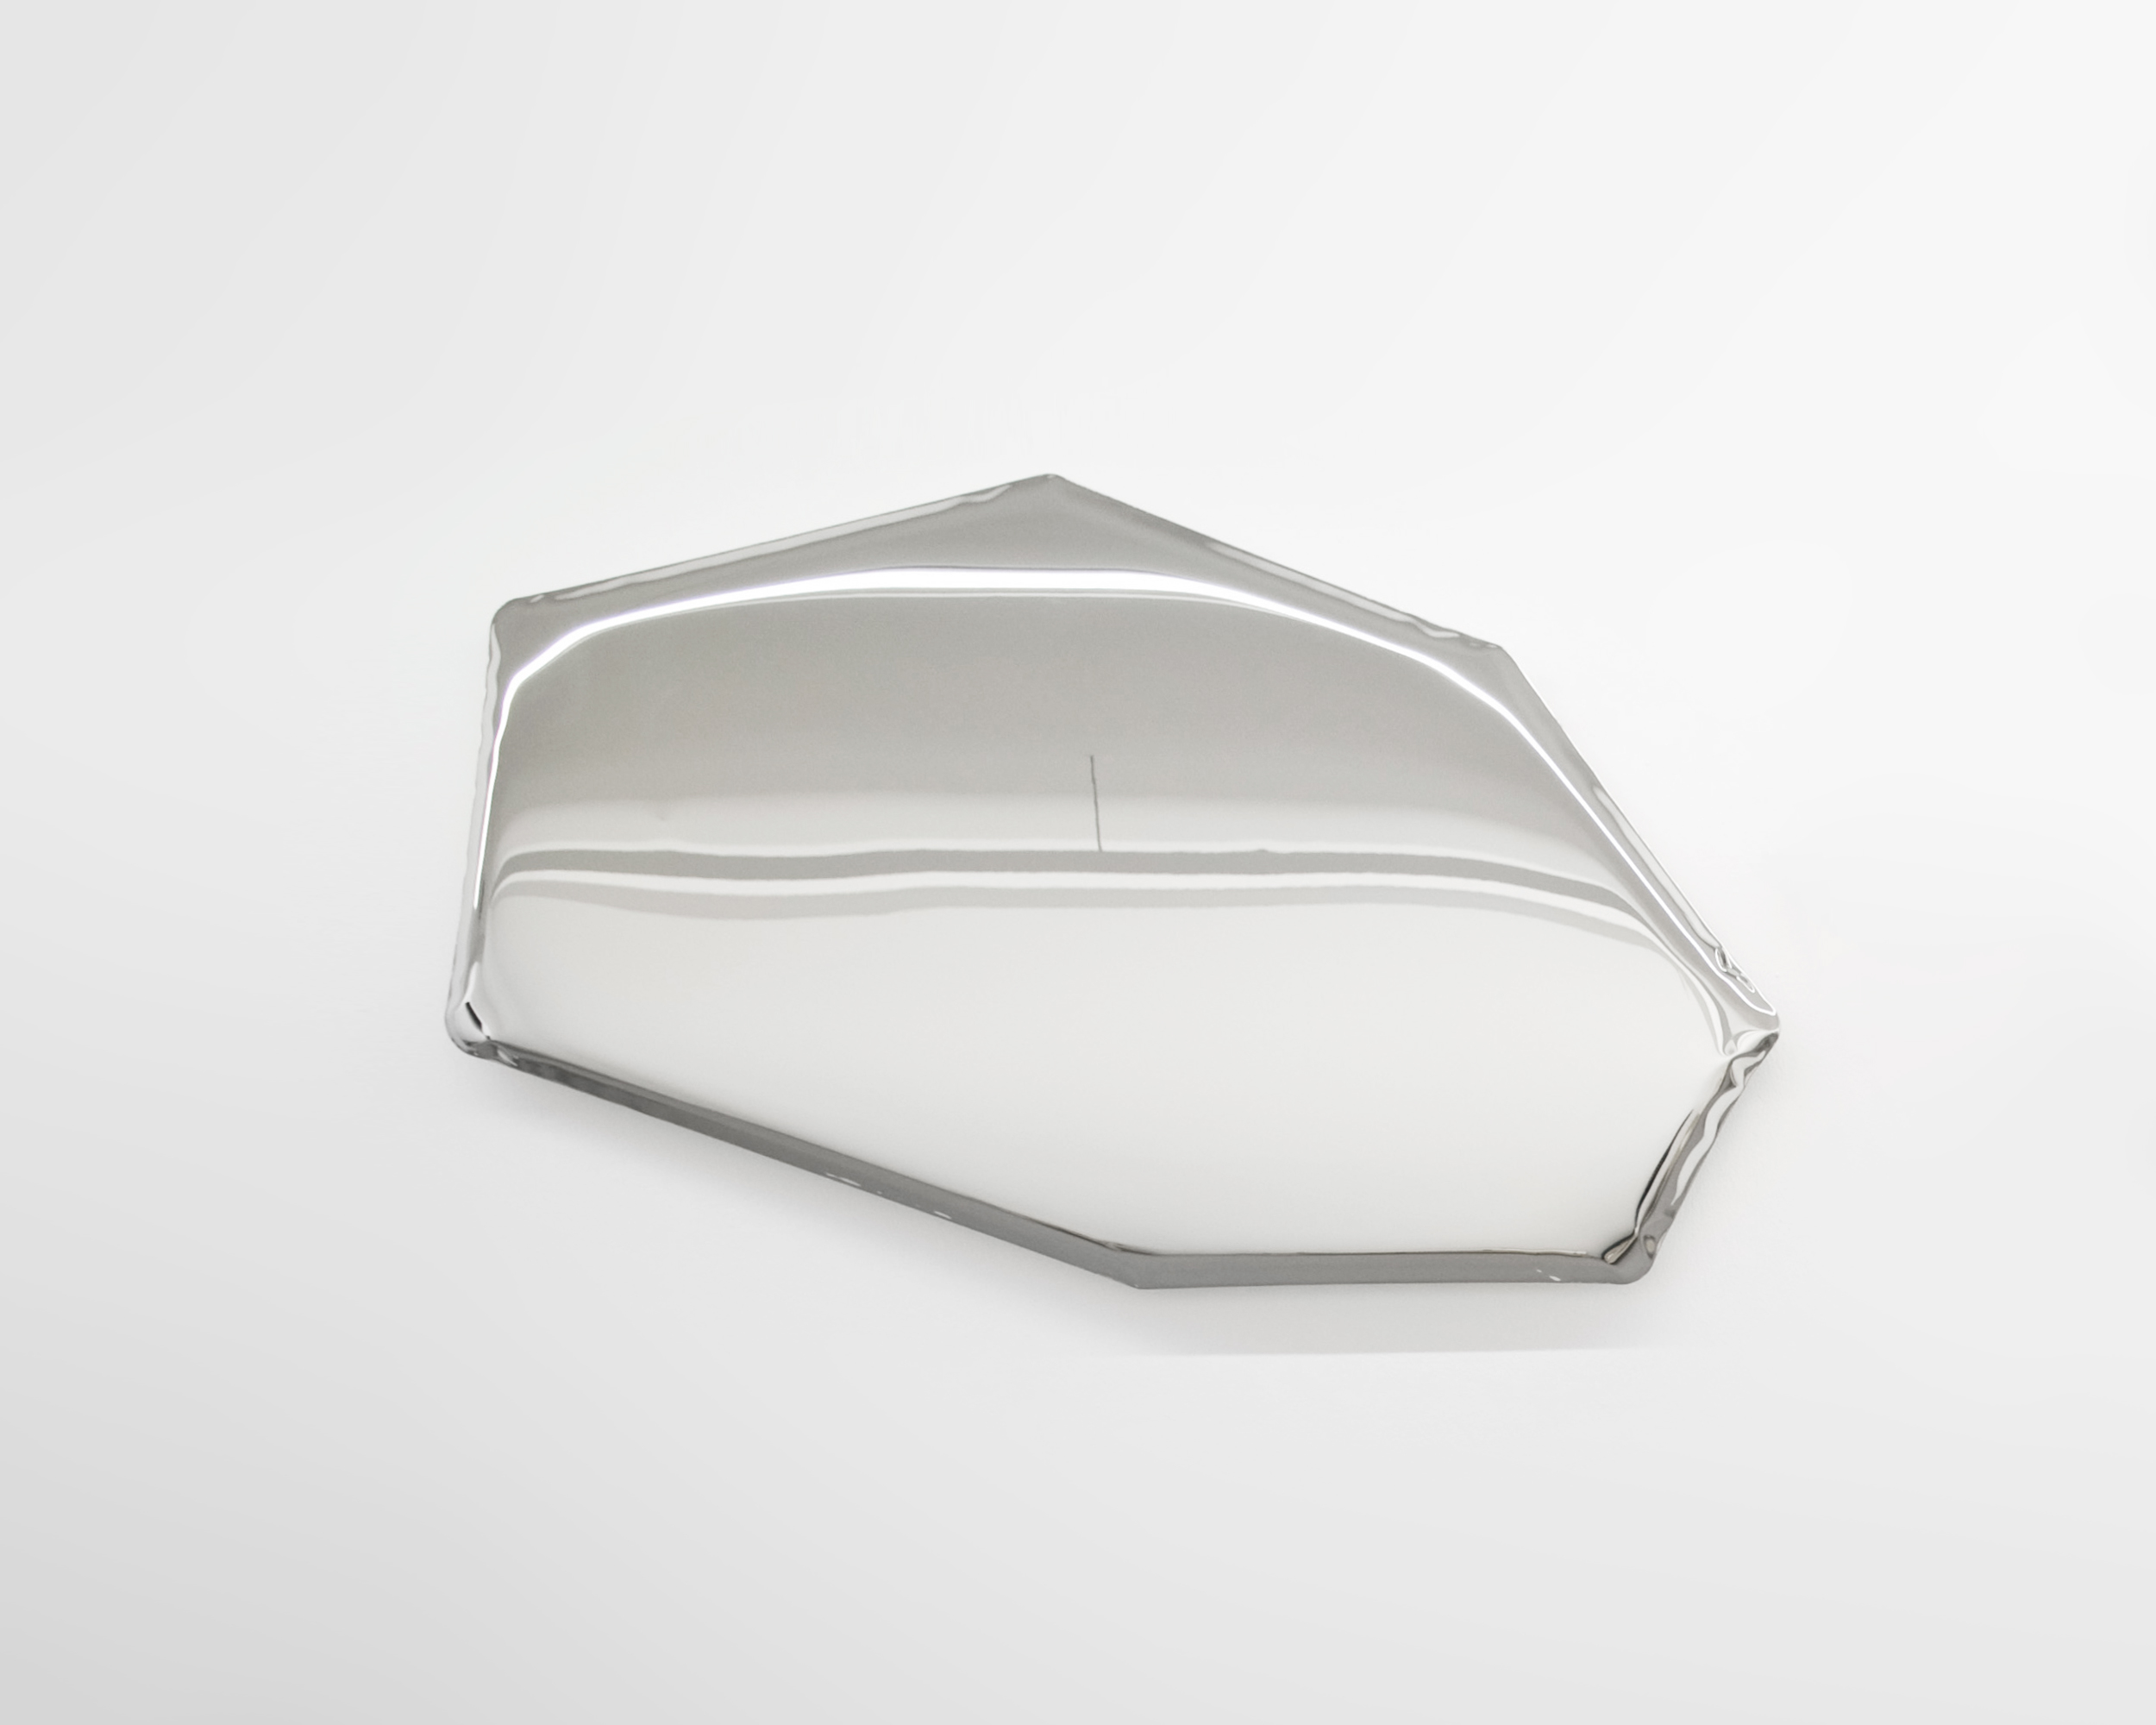 Zieta-Prozessdesign-Tafla-Mirror-Savannah-Bay-Gallery